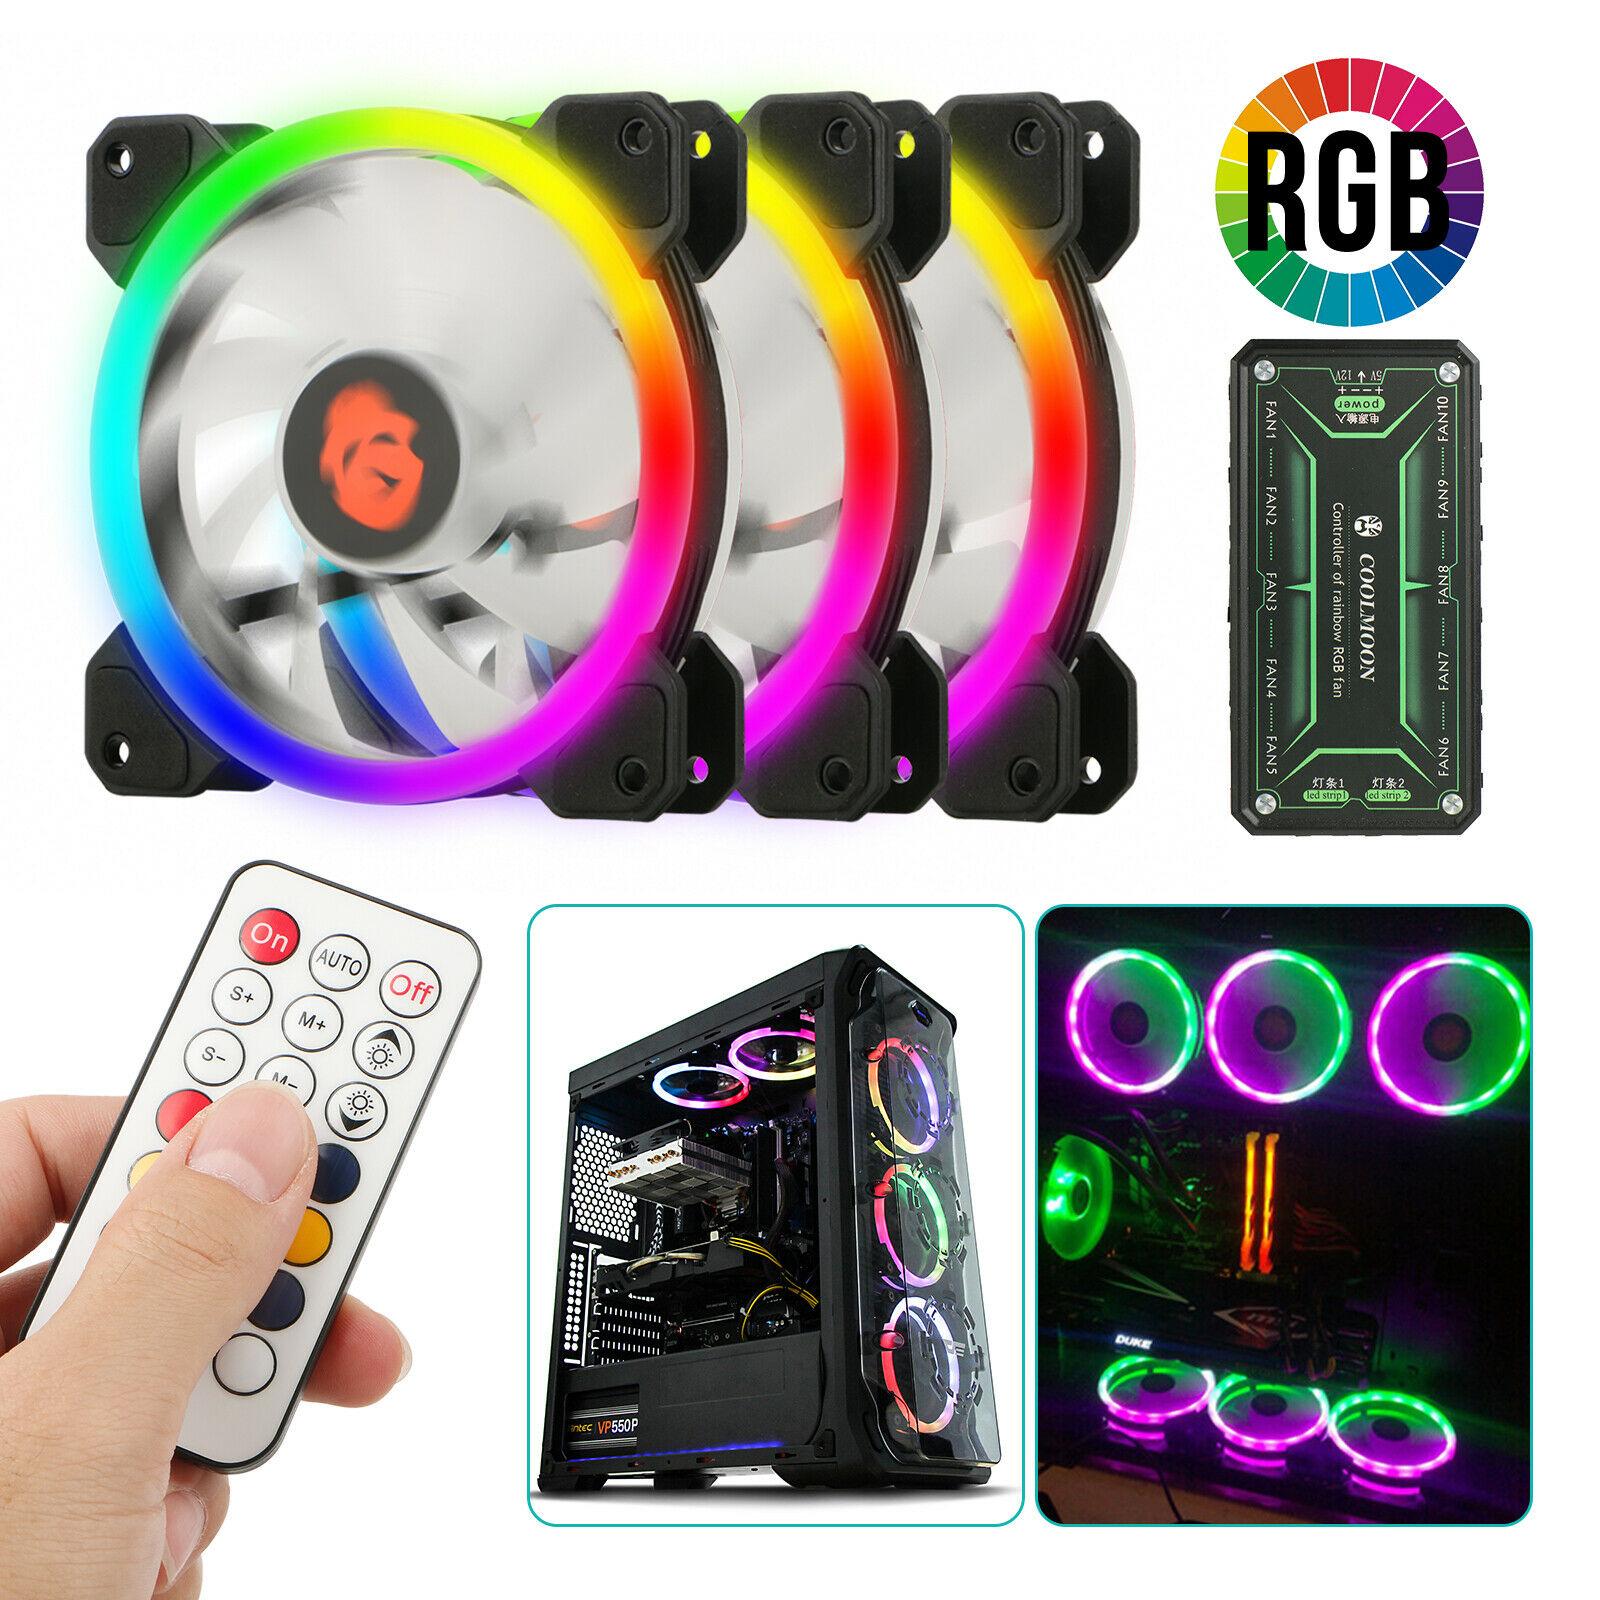 3-Pack LED Cooling Fan RGB 120mm 12V w/ Remote Control For Computer Case PC CPU3-Pack LED Cooling Fan RGB 120mm 12V w/ Remote Control For Computer Case PC CPU